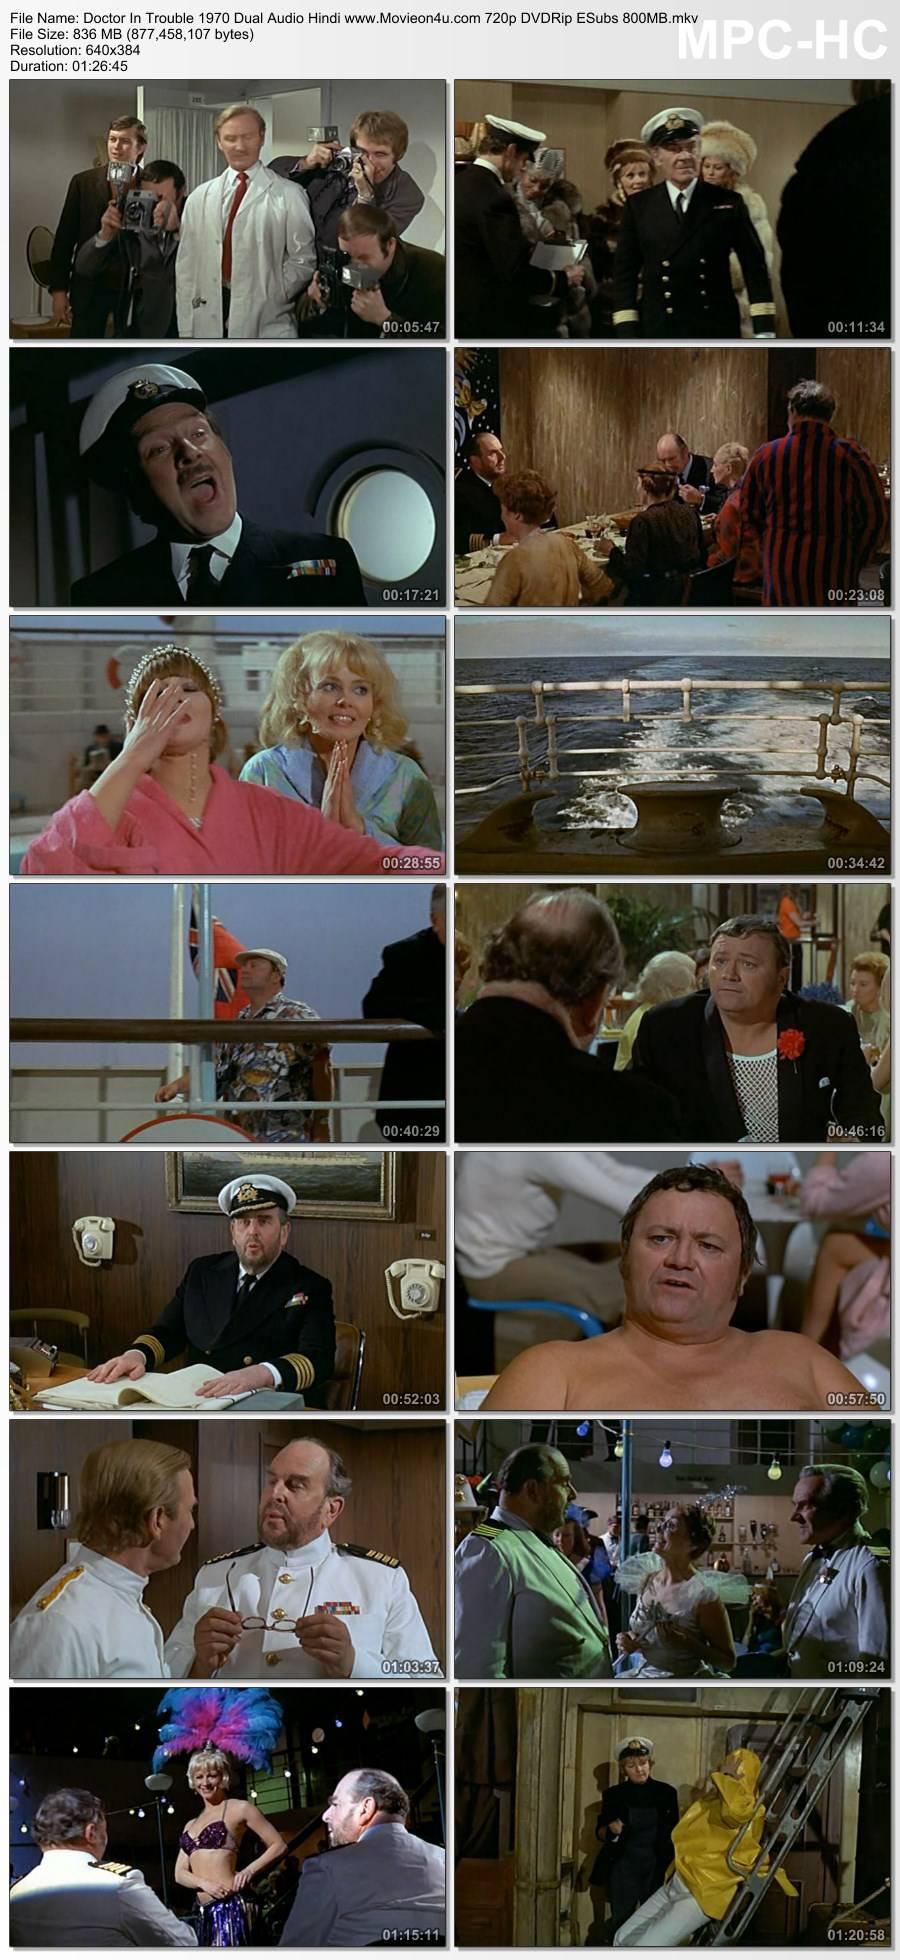 Doctor In Trouble 1970 Dual Audio Hindi 720p DVDRip ESubs 800MB Download HD